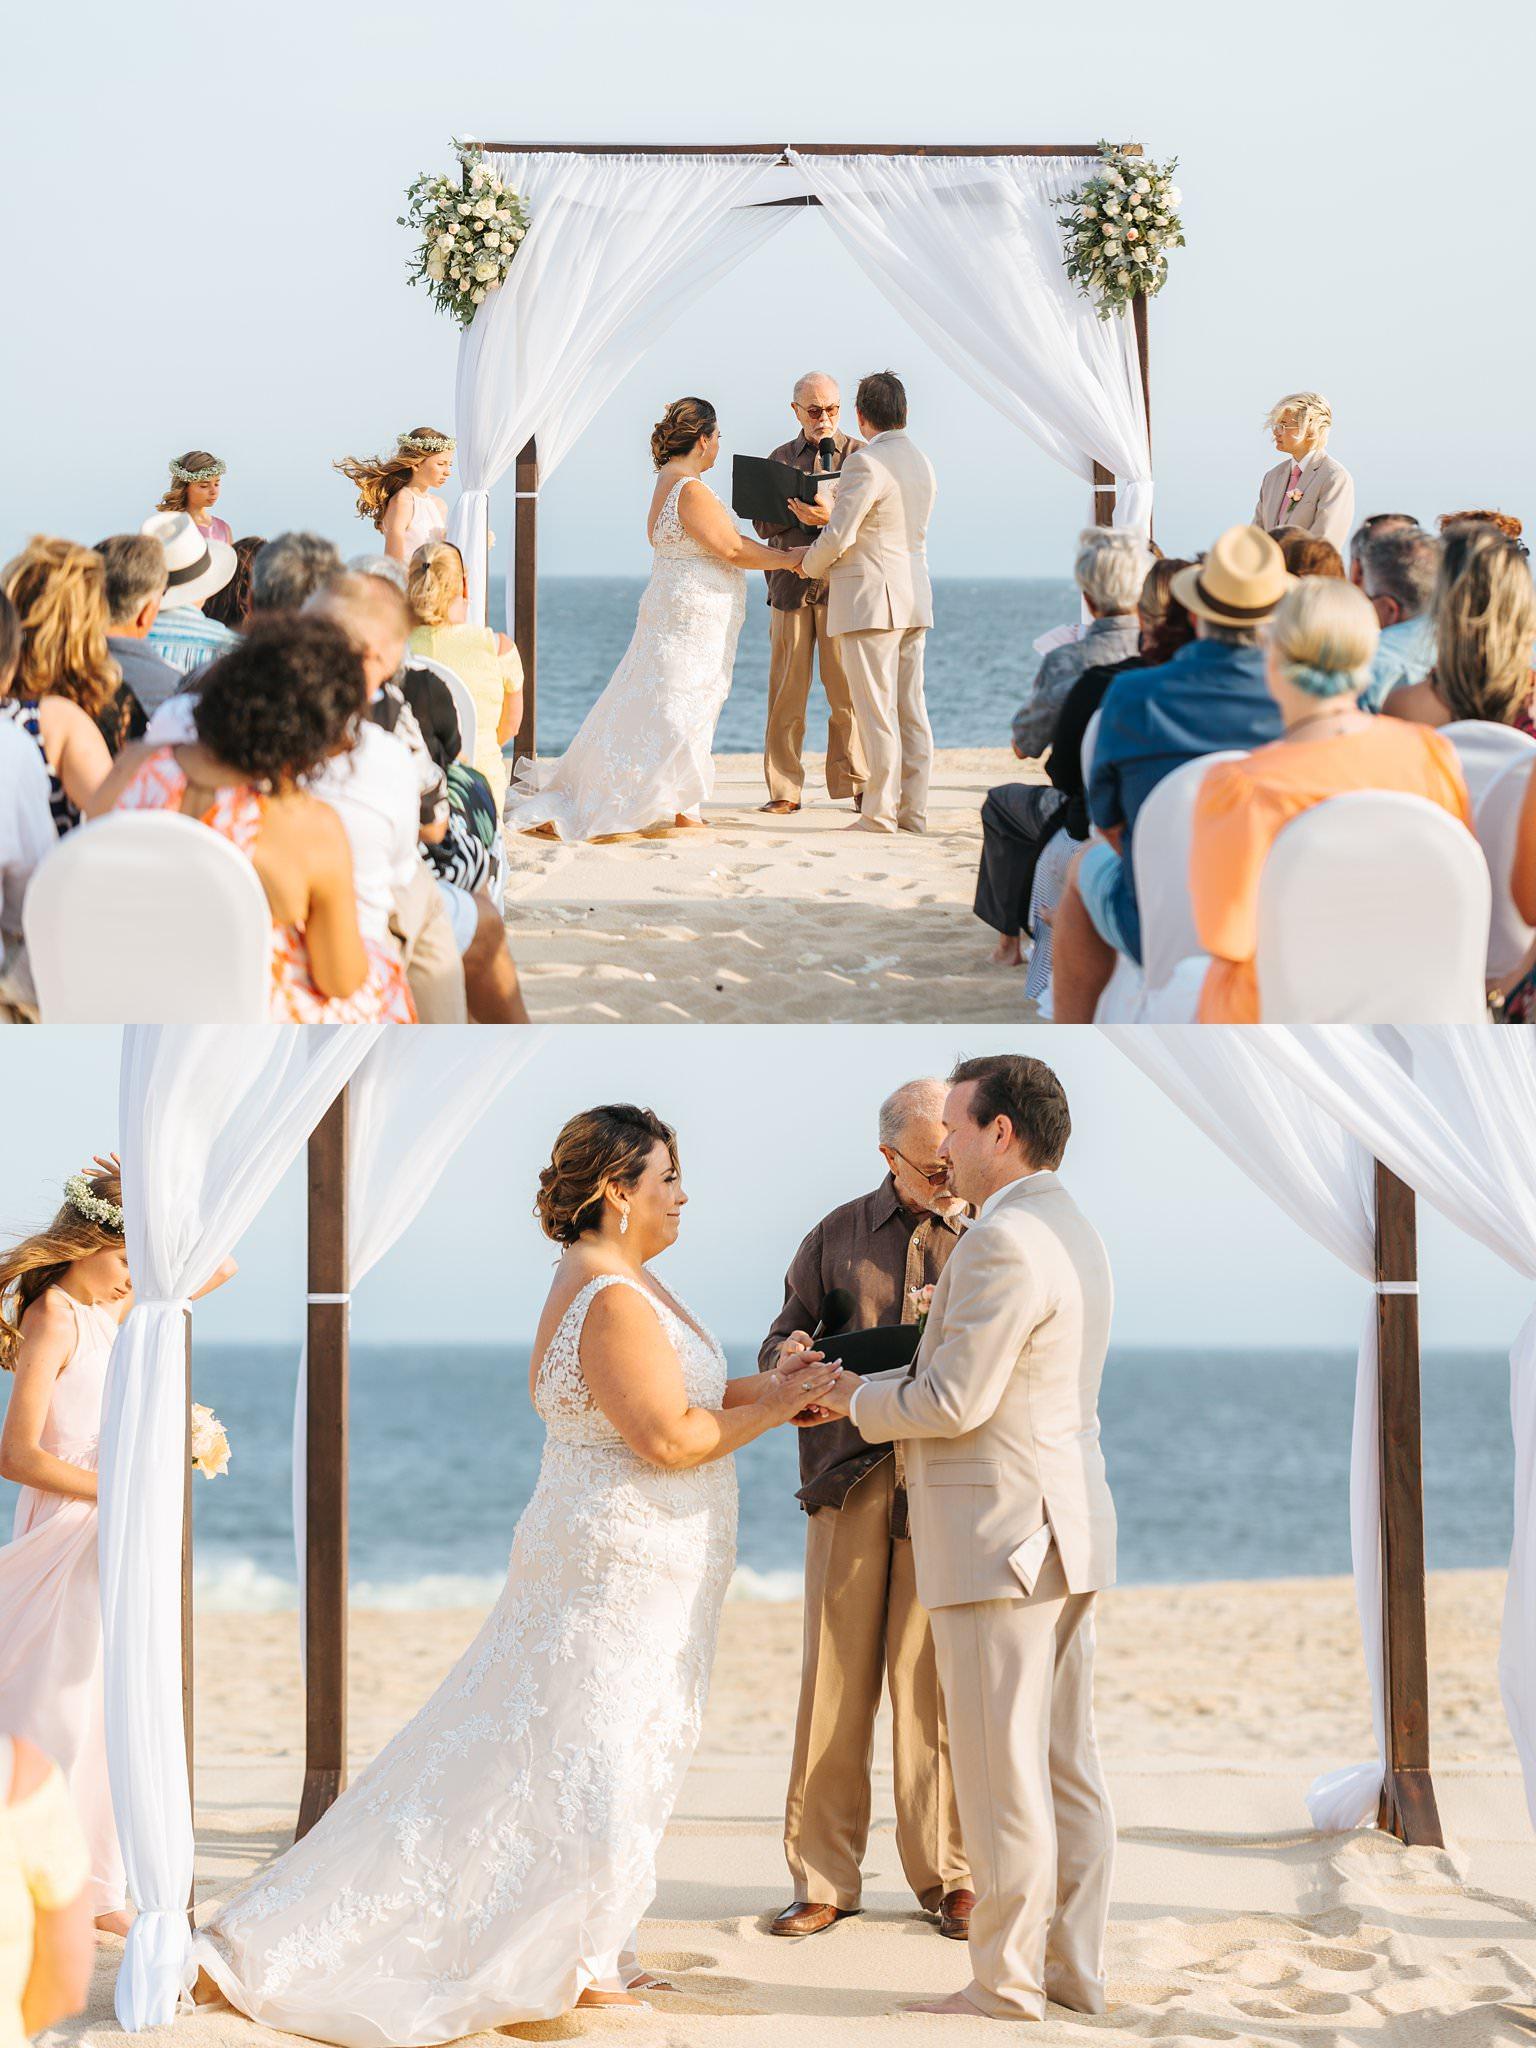 Beach Ceremony in Cabo - Destination Wedding - https://brittneyhannonphotography.com